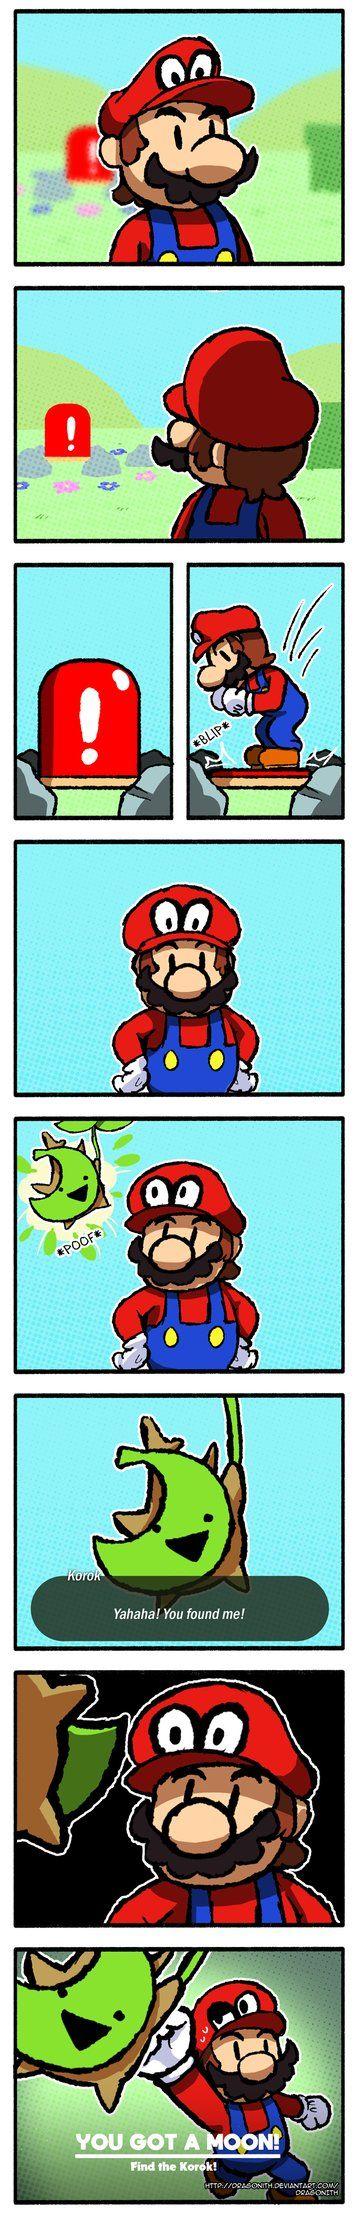 Pin On Nintendo